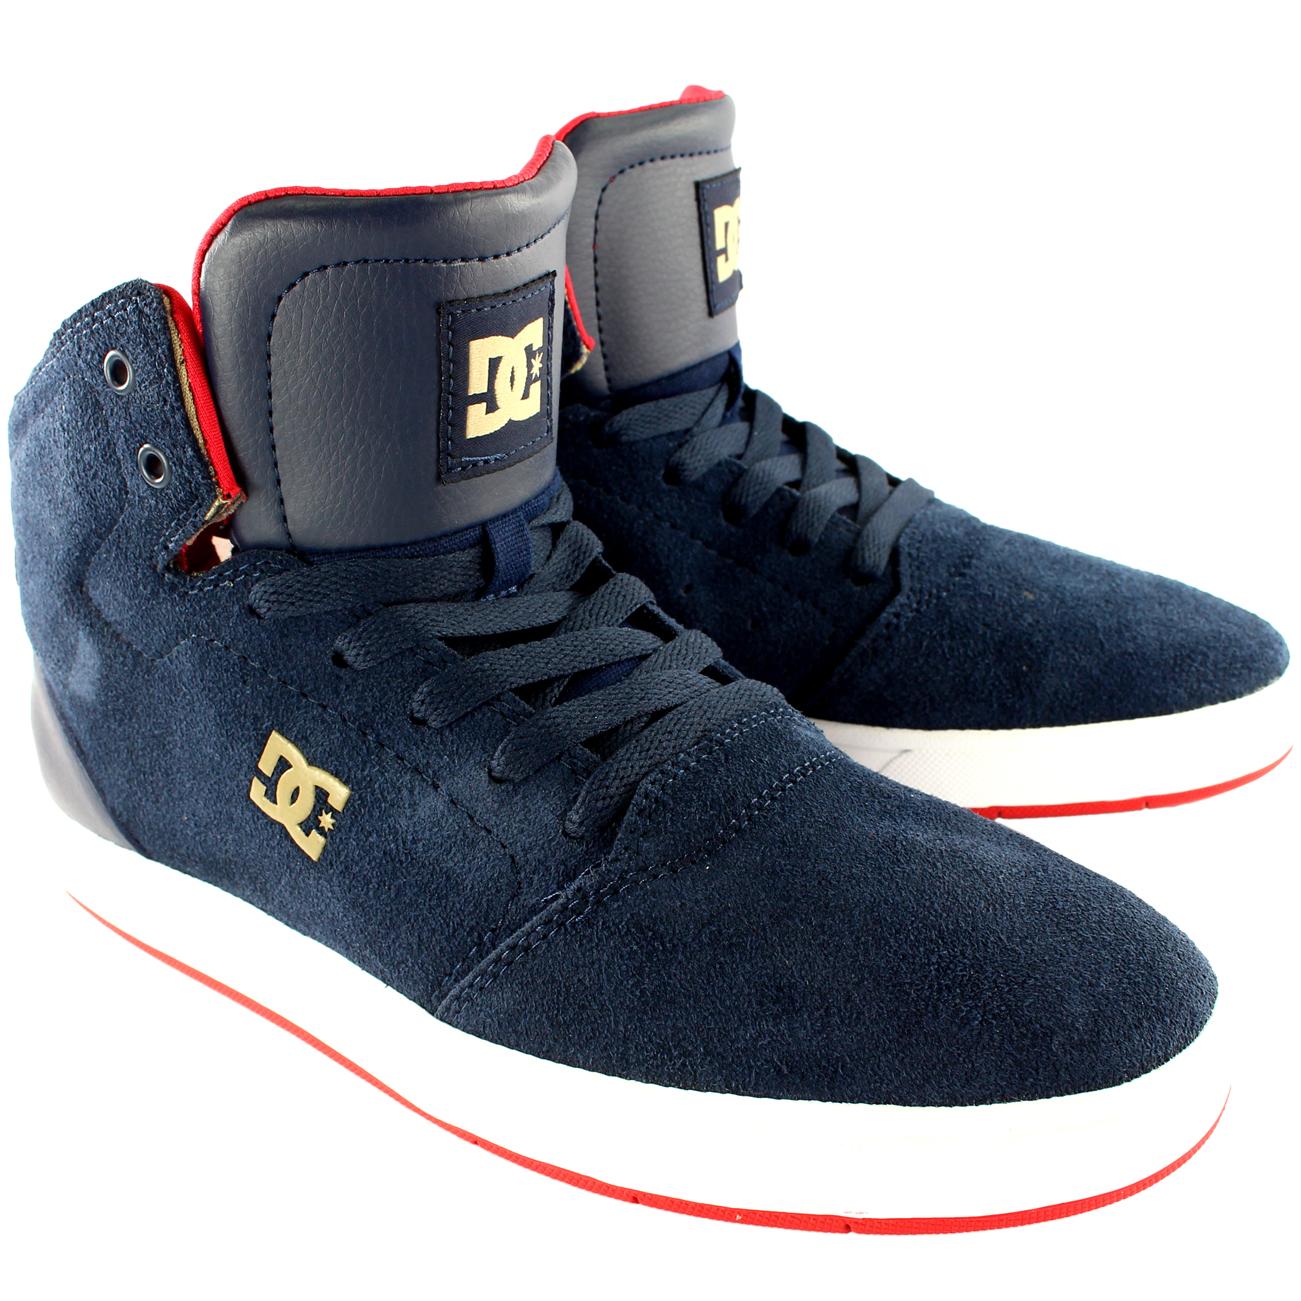 DC Shoes Crisis High Top Skate Shoes